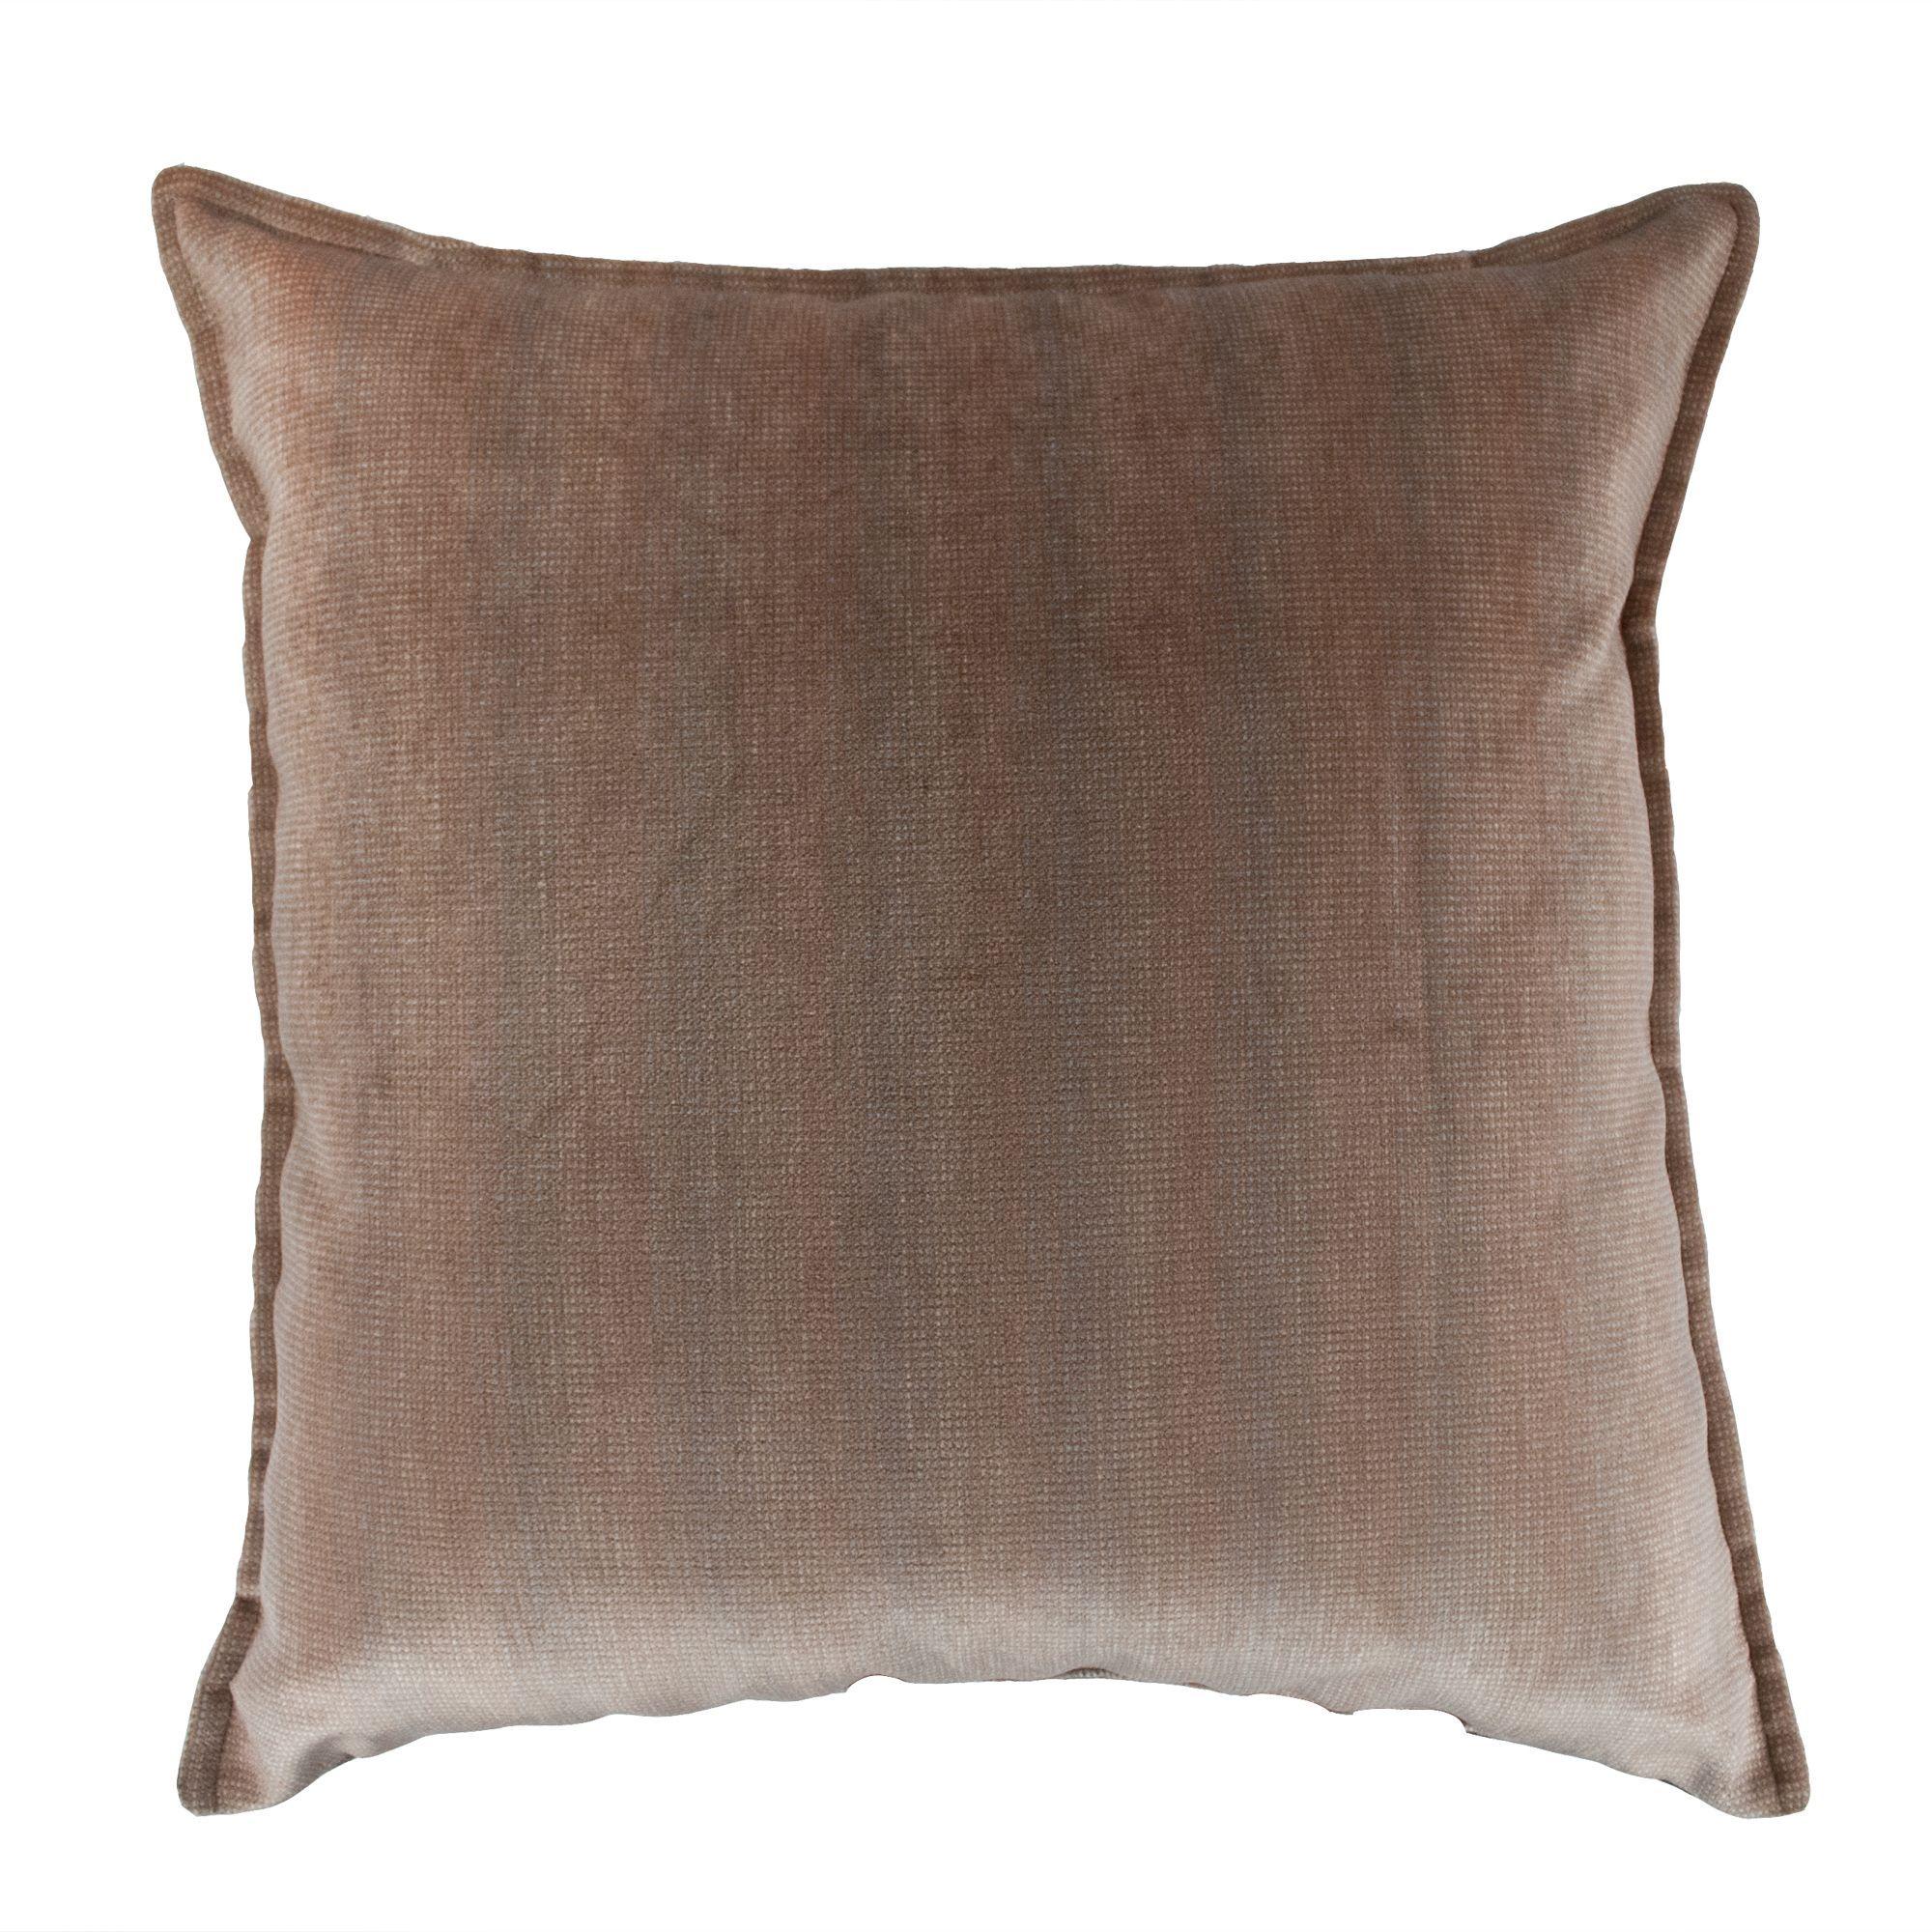 Sherry Kline Sevilla 24-inch Decorative Throw Pillow